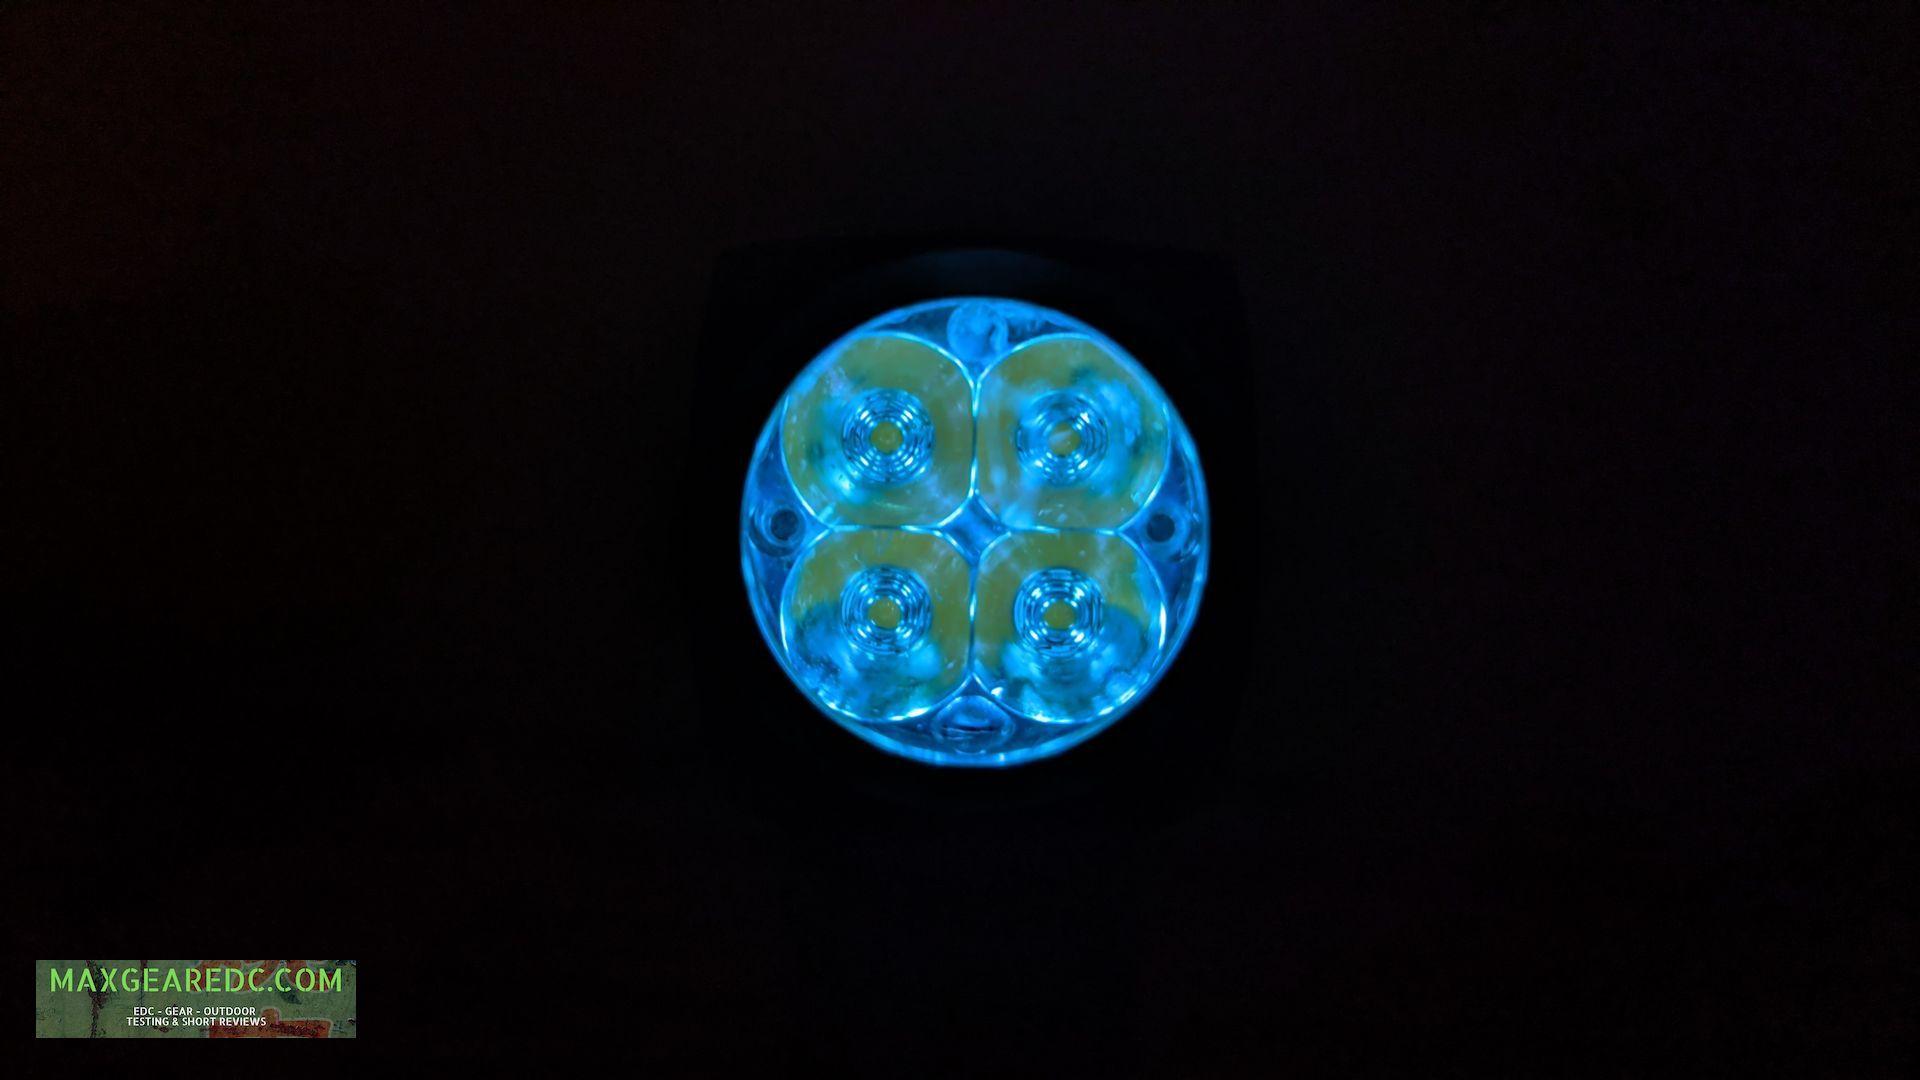 Fireflies_PL47G2_Flashlight_Review_Headlight_EDC_21700_maxgearedc.com_EDC_GEAR_OUTDOOR_TESTING_and_SHORT_REVIEWS_20